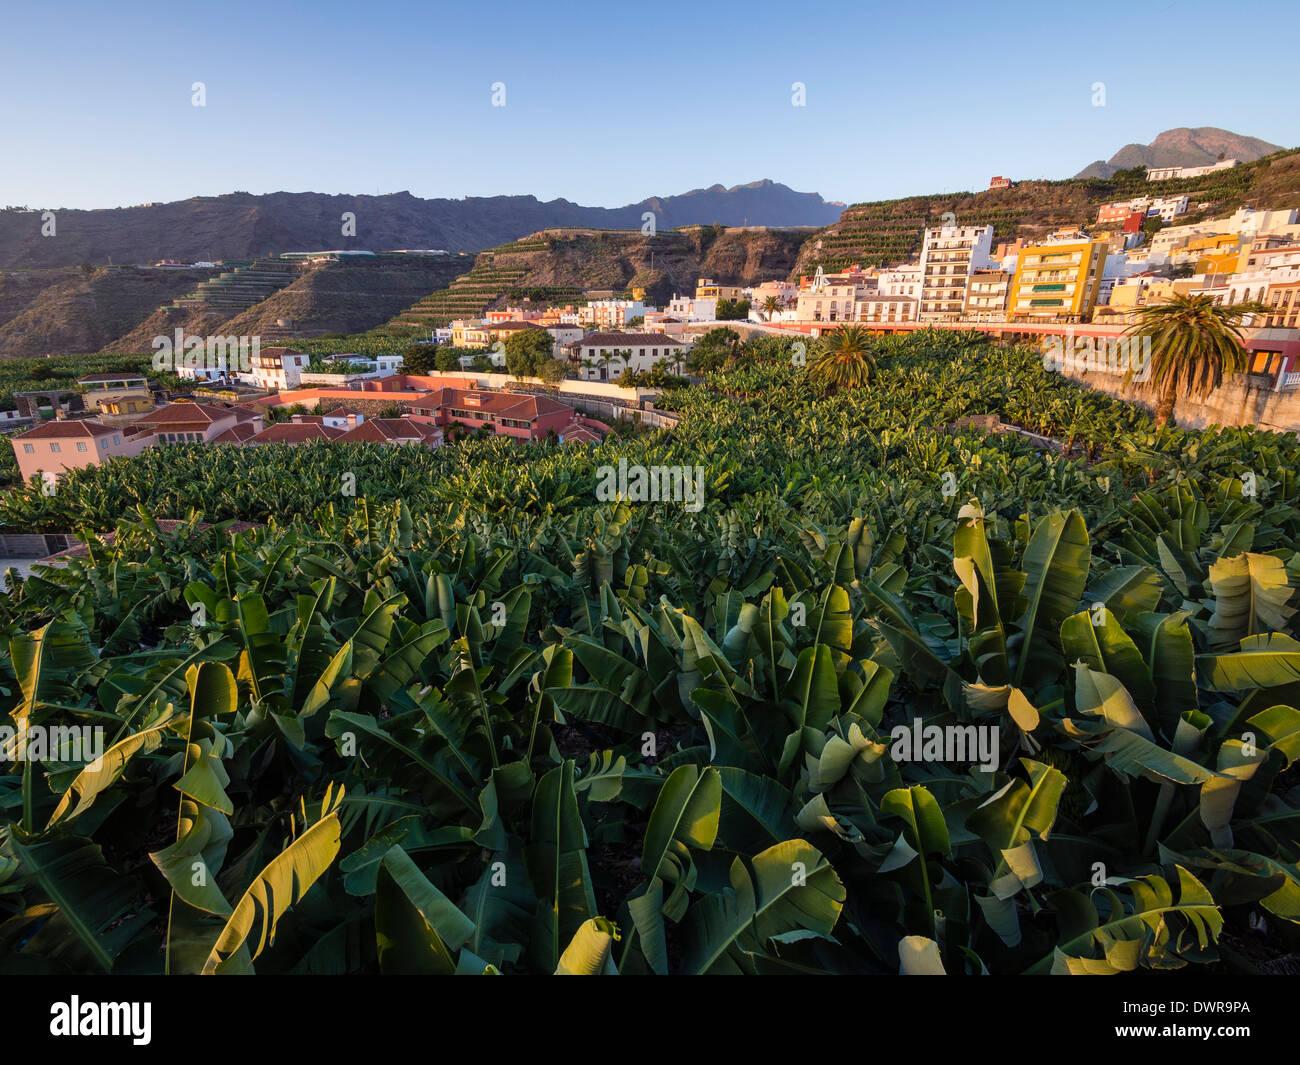 A banana plantation in the town of Tazacorte on the Canary Island of La Palma. - Stock Image